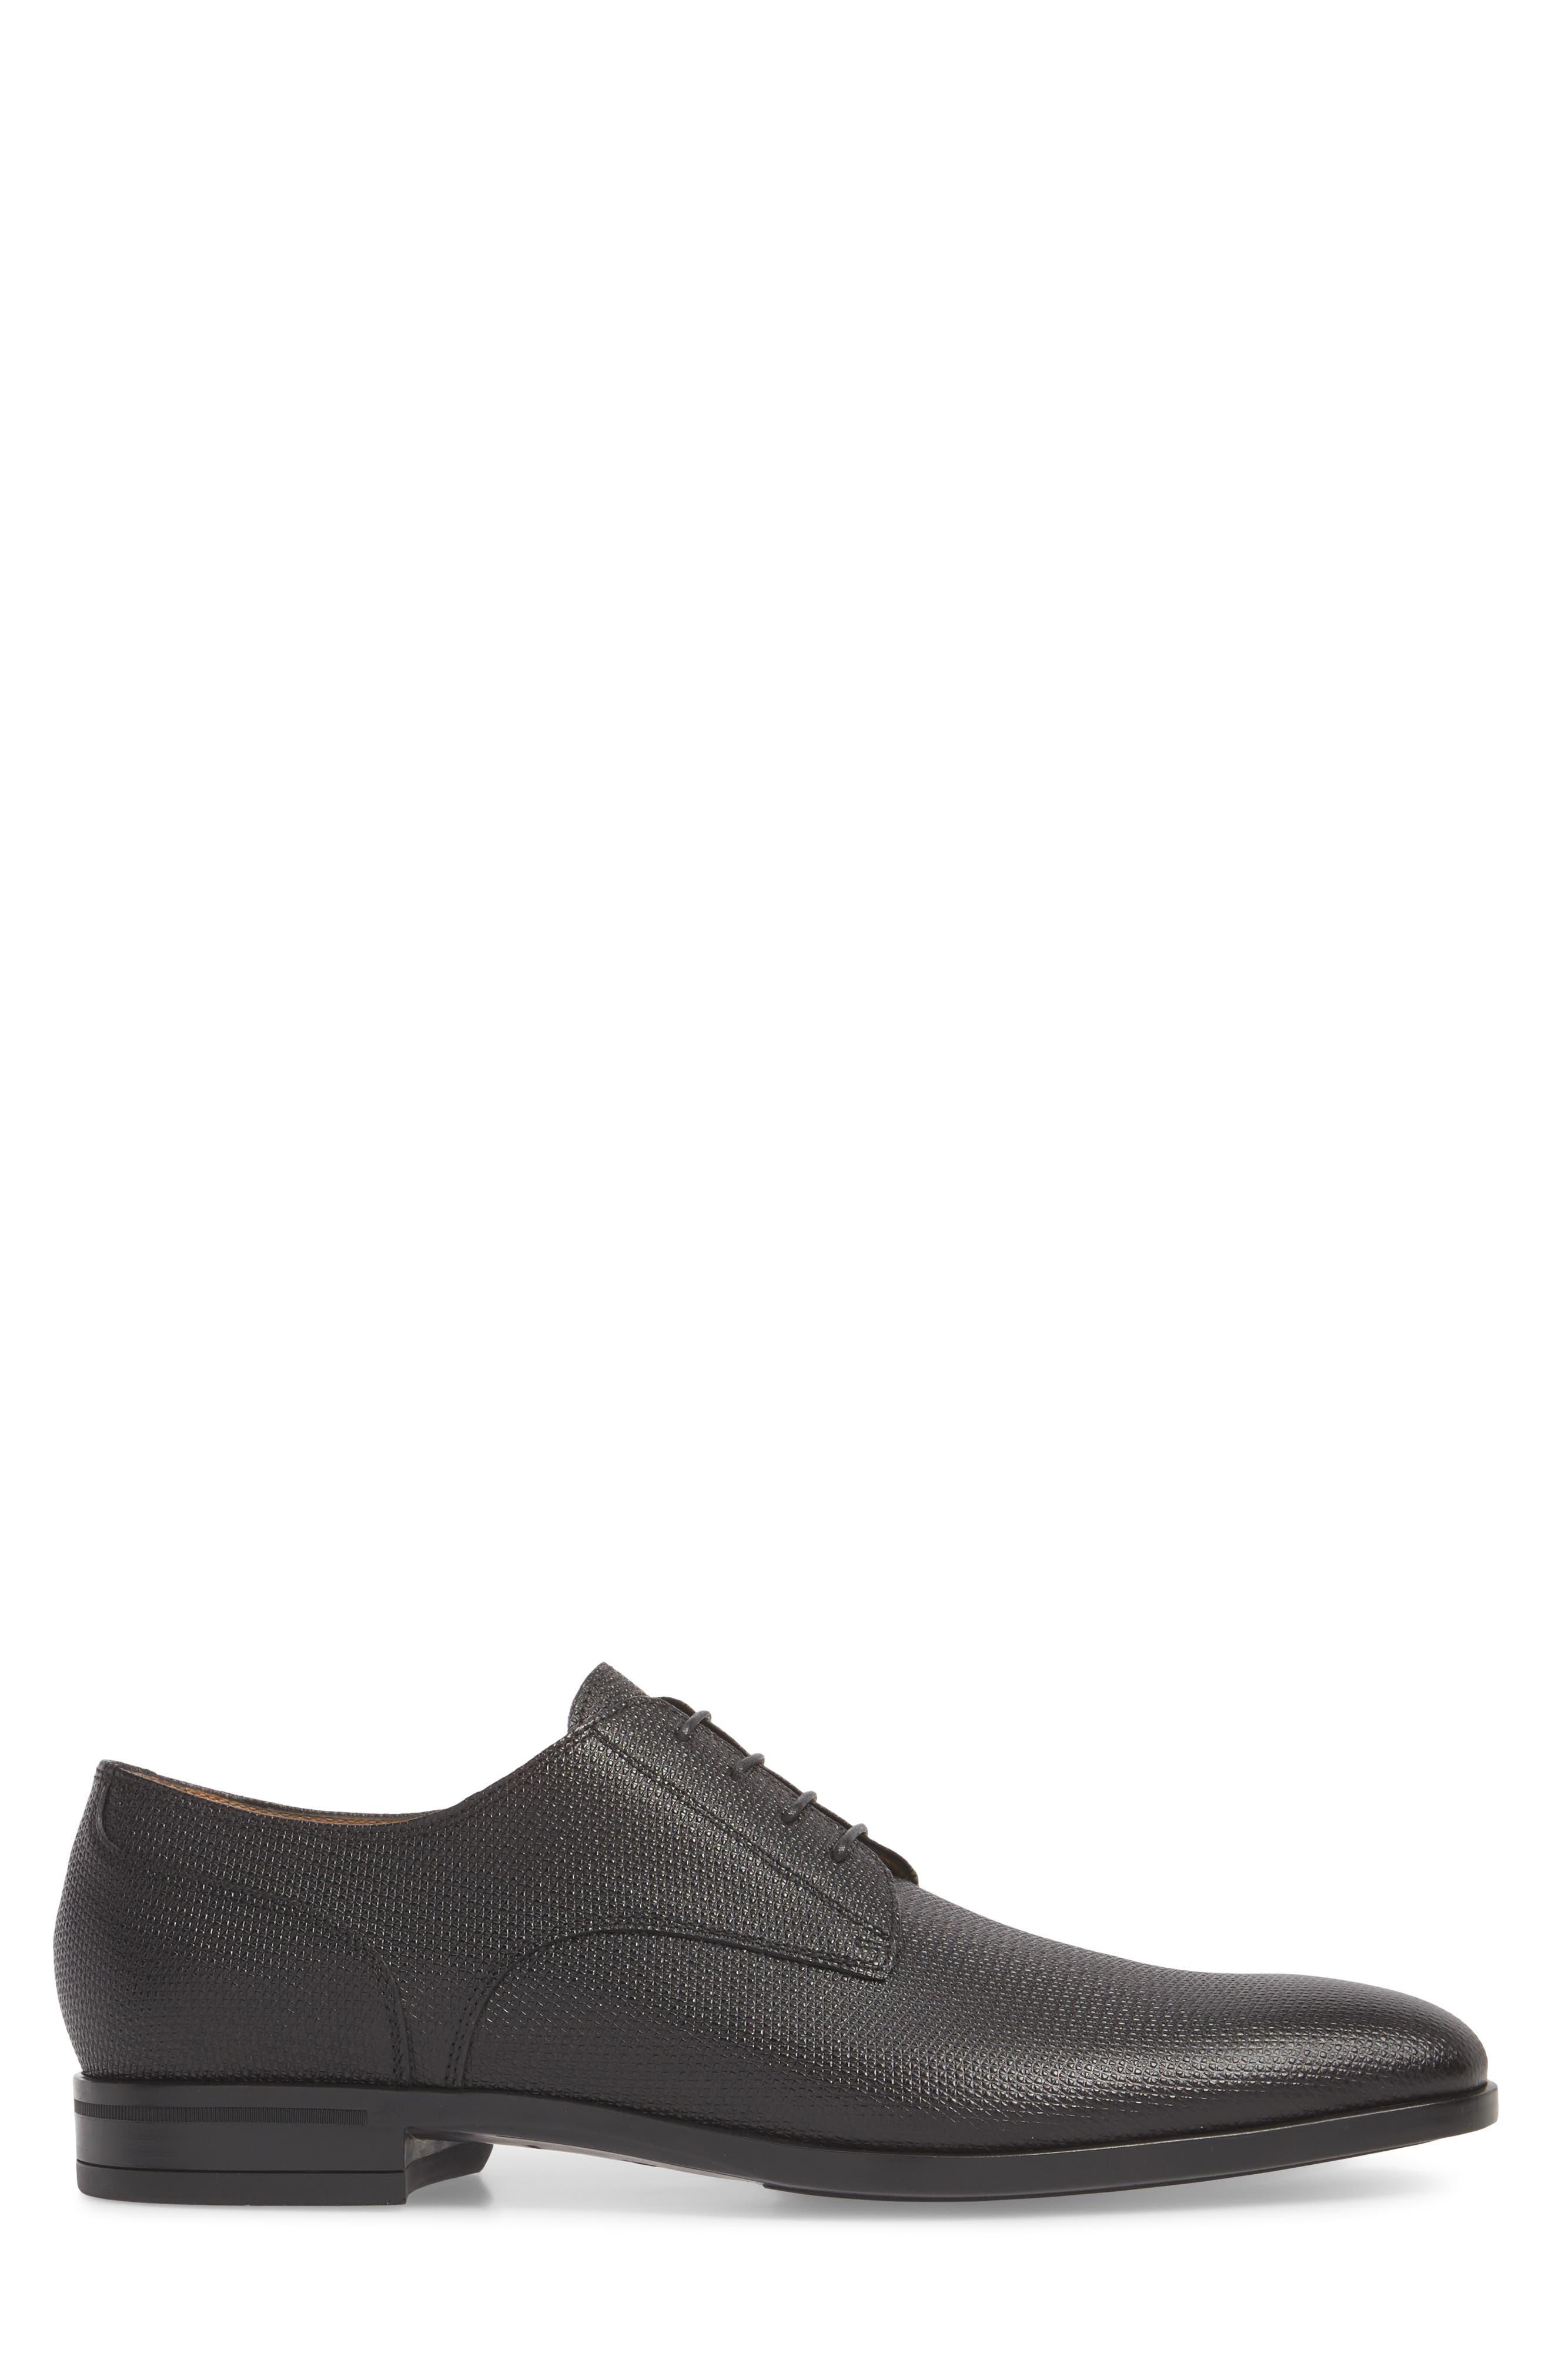 Hugo Boss Portland Embossed Plain Toe Derby,                             Alternate thumbnail 3, color,                             BLACK LEATHER